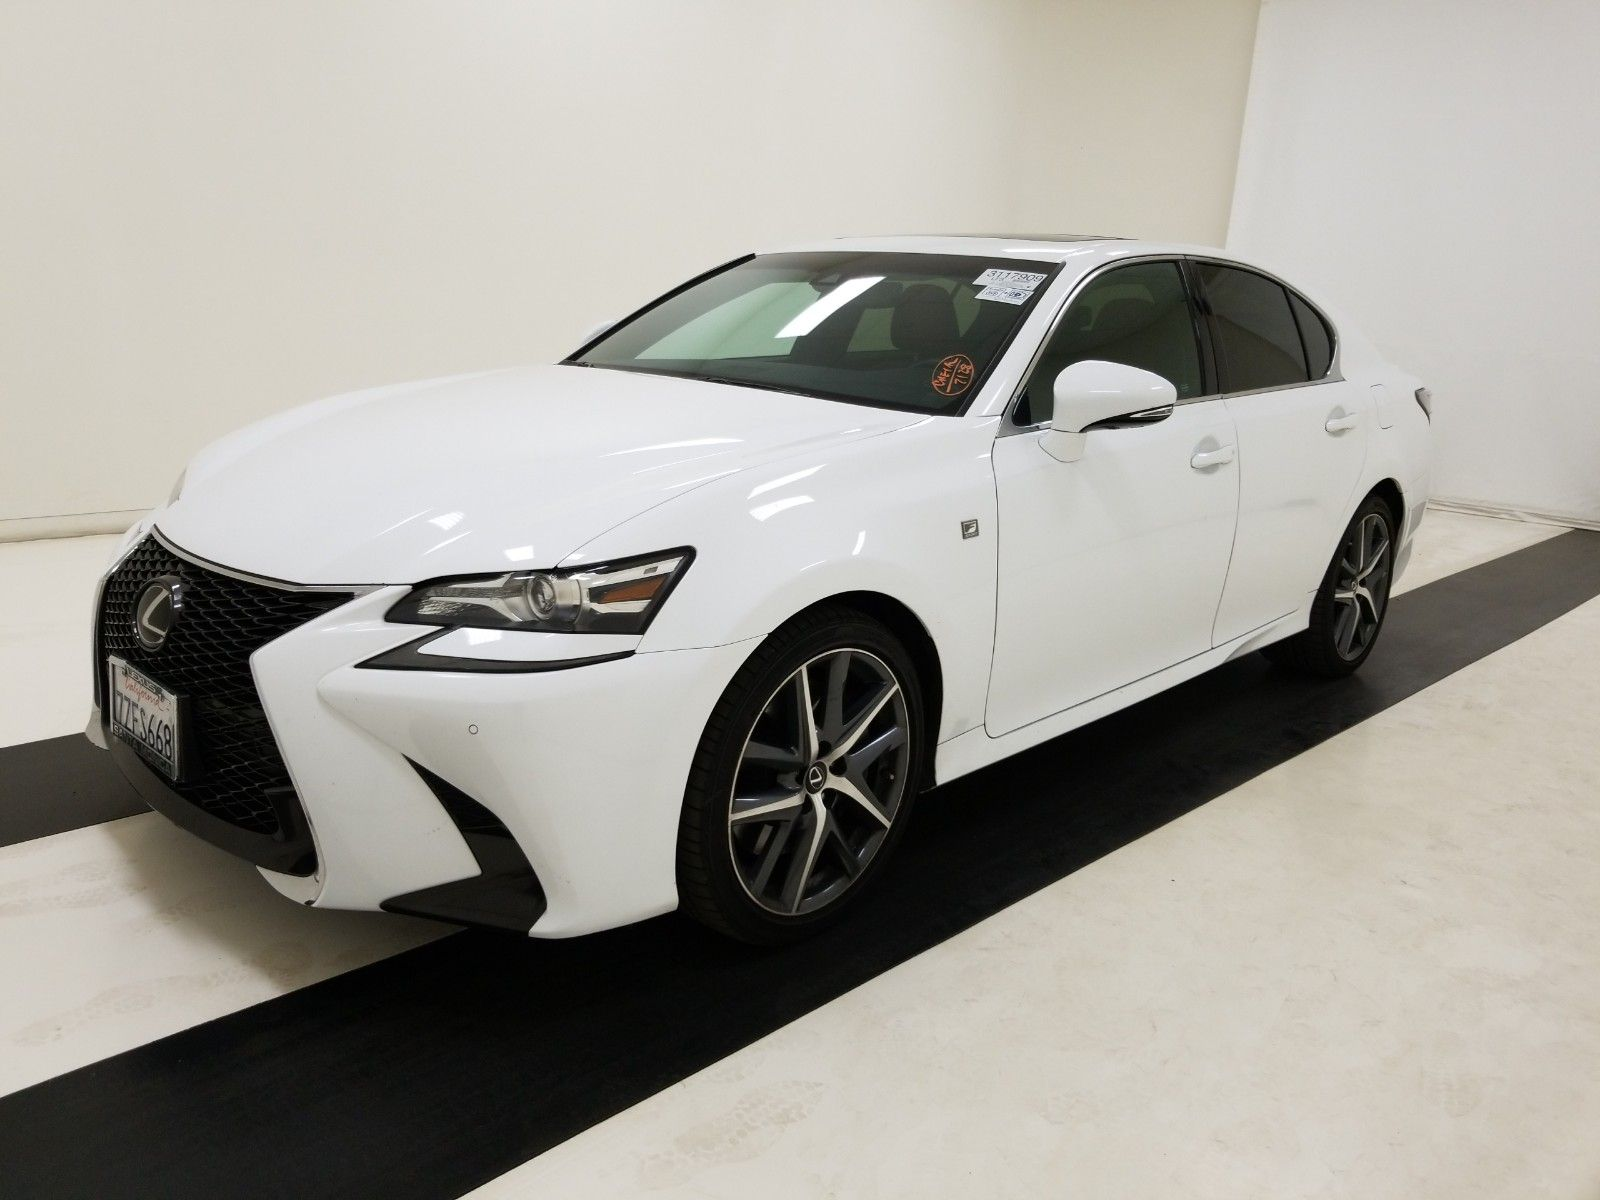 2017 Lexus Gs 3.5. Lot 99913845168 Vin JTHBZ1BL0HA010799